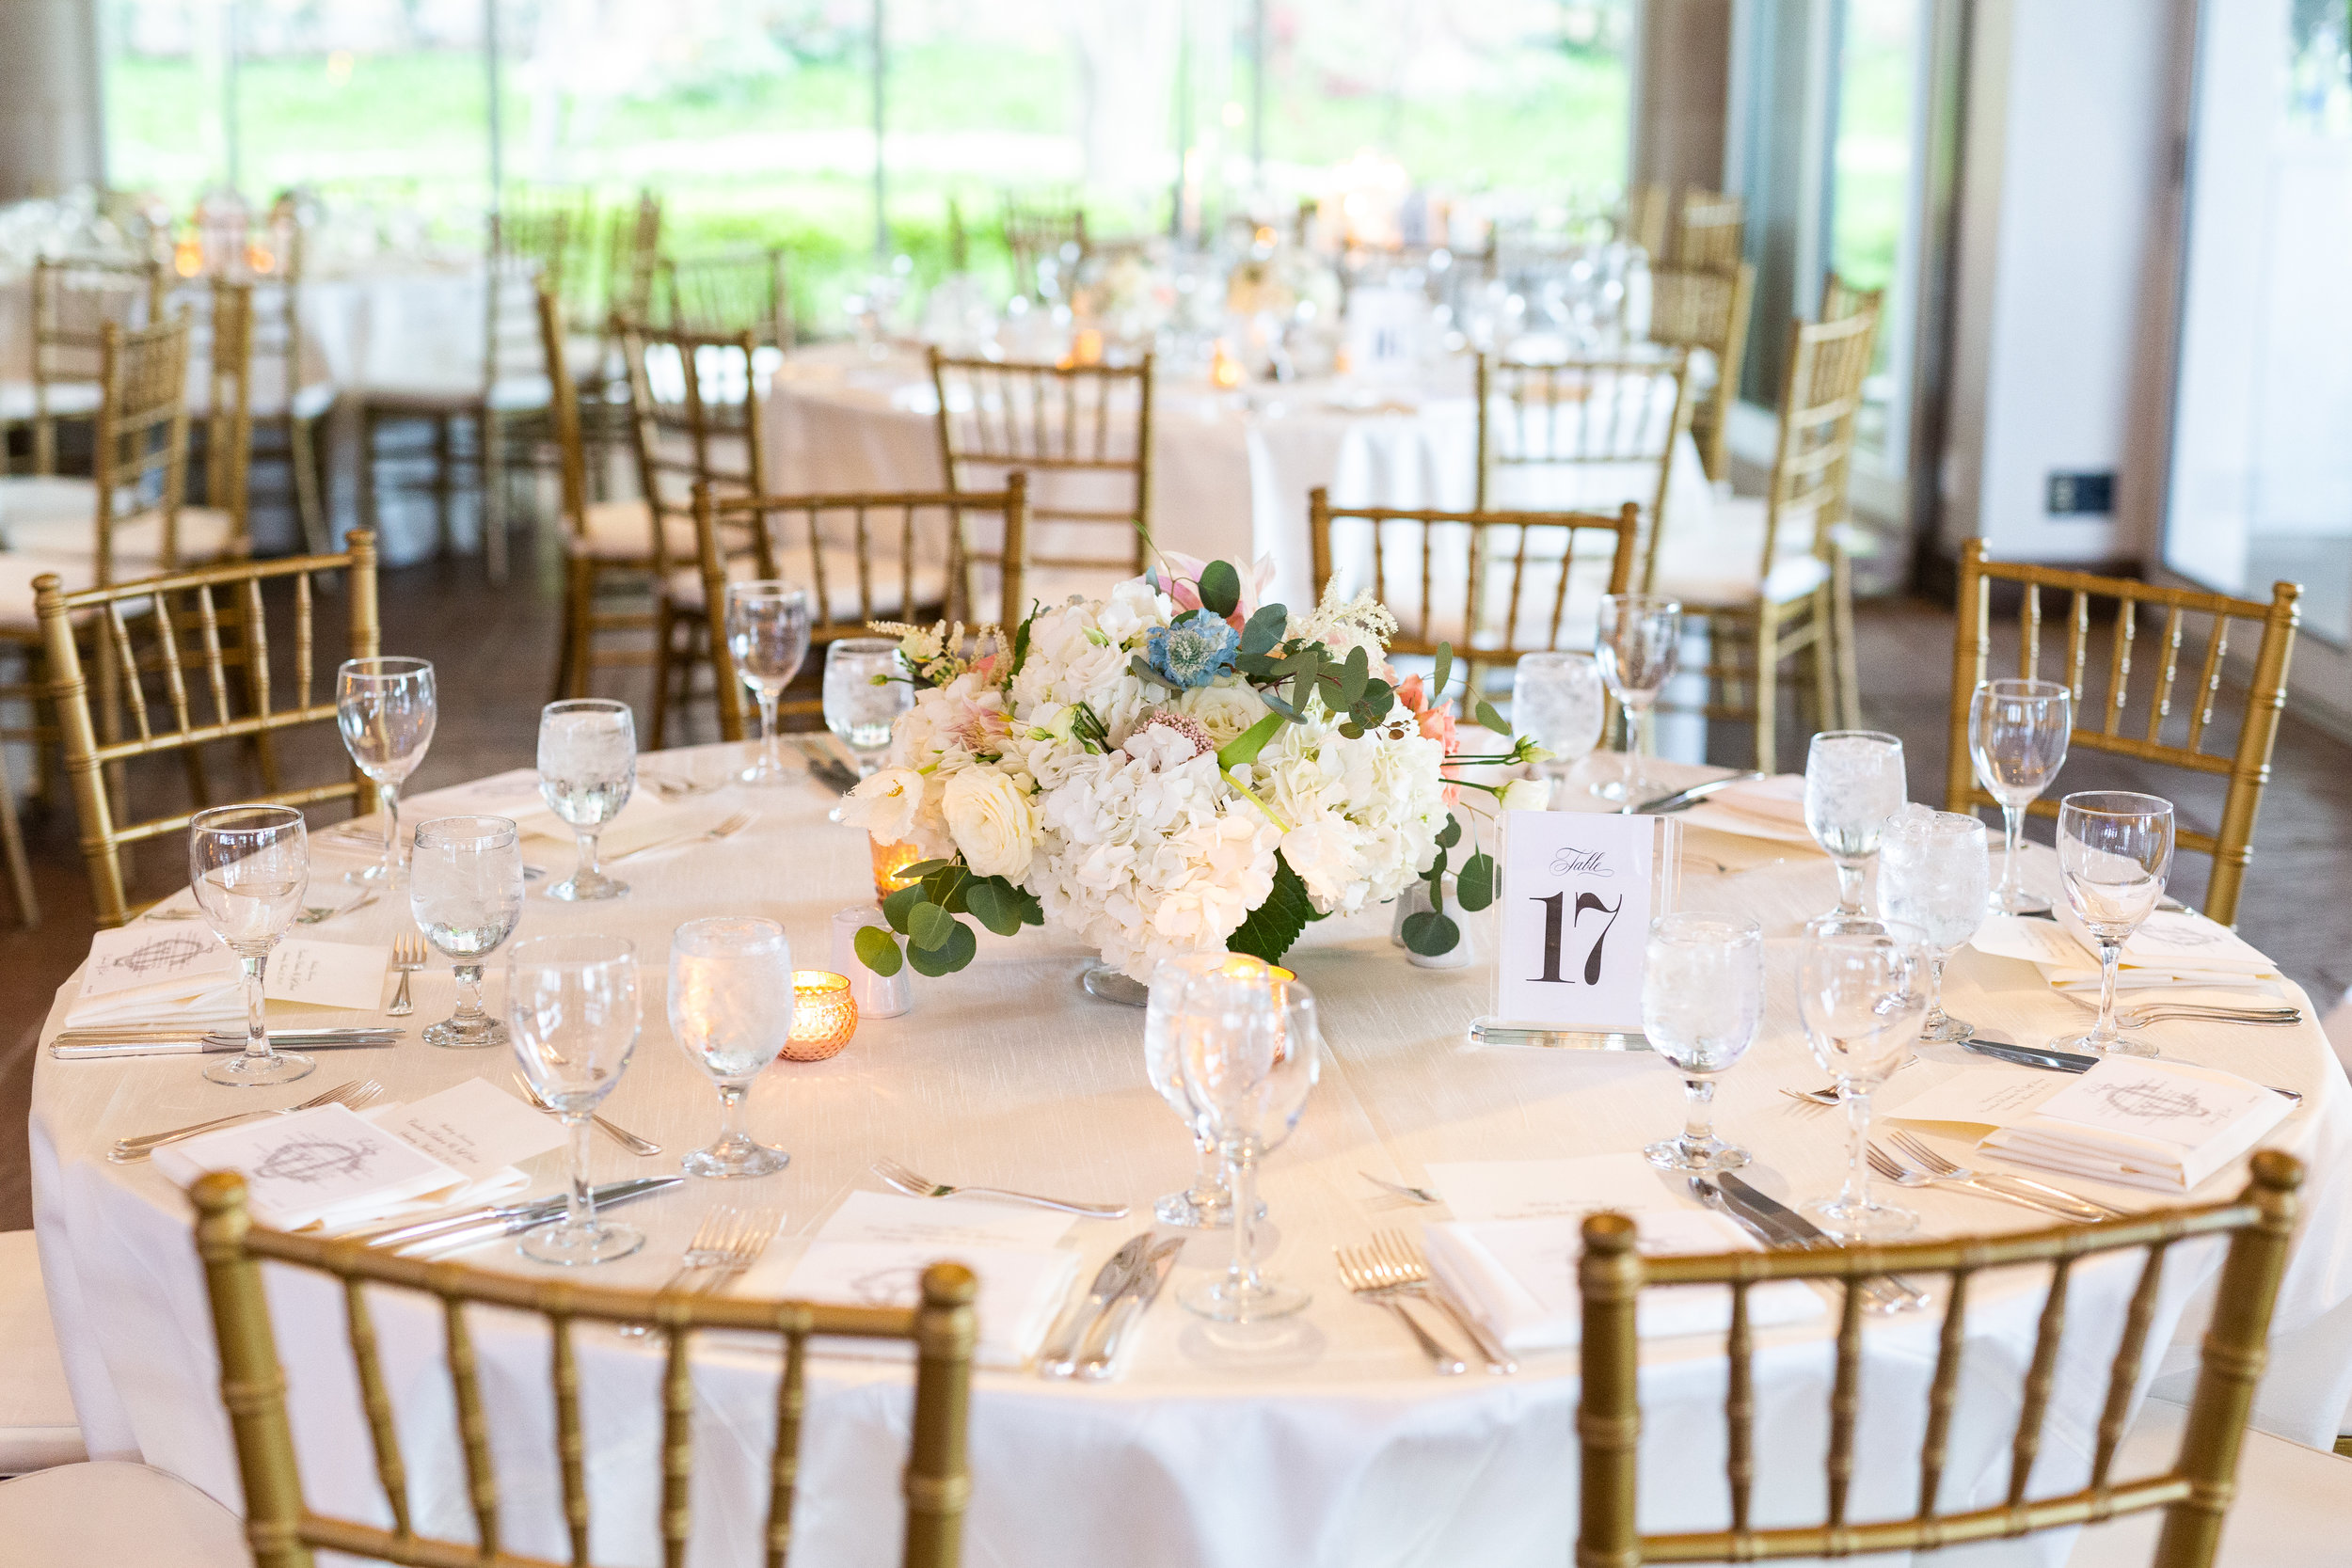 DFW Wedding Planner - Caroline + Jeff at The Four Seasons Hotel Wedding - Allday Events - 143.jpg